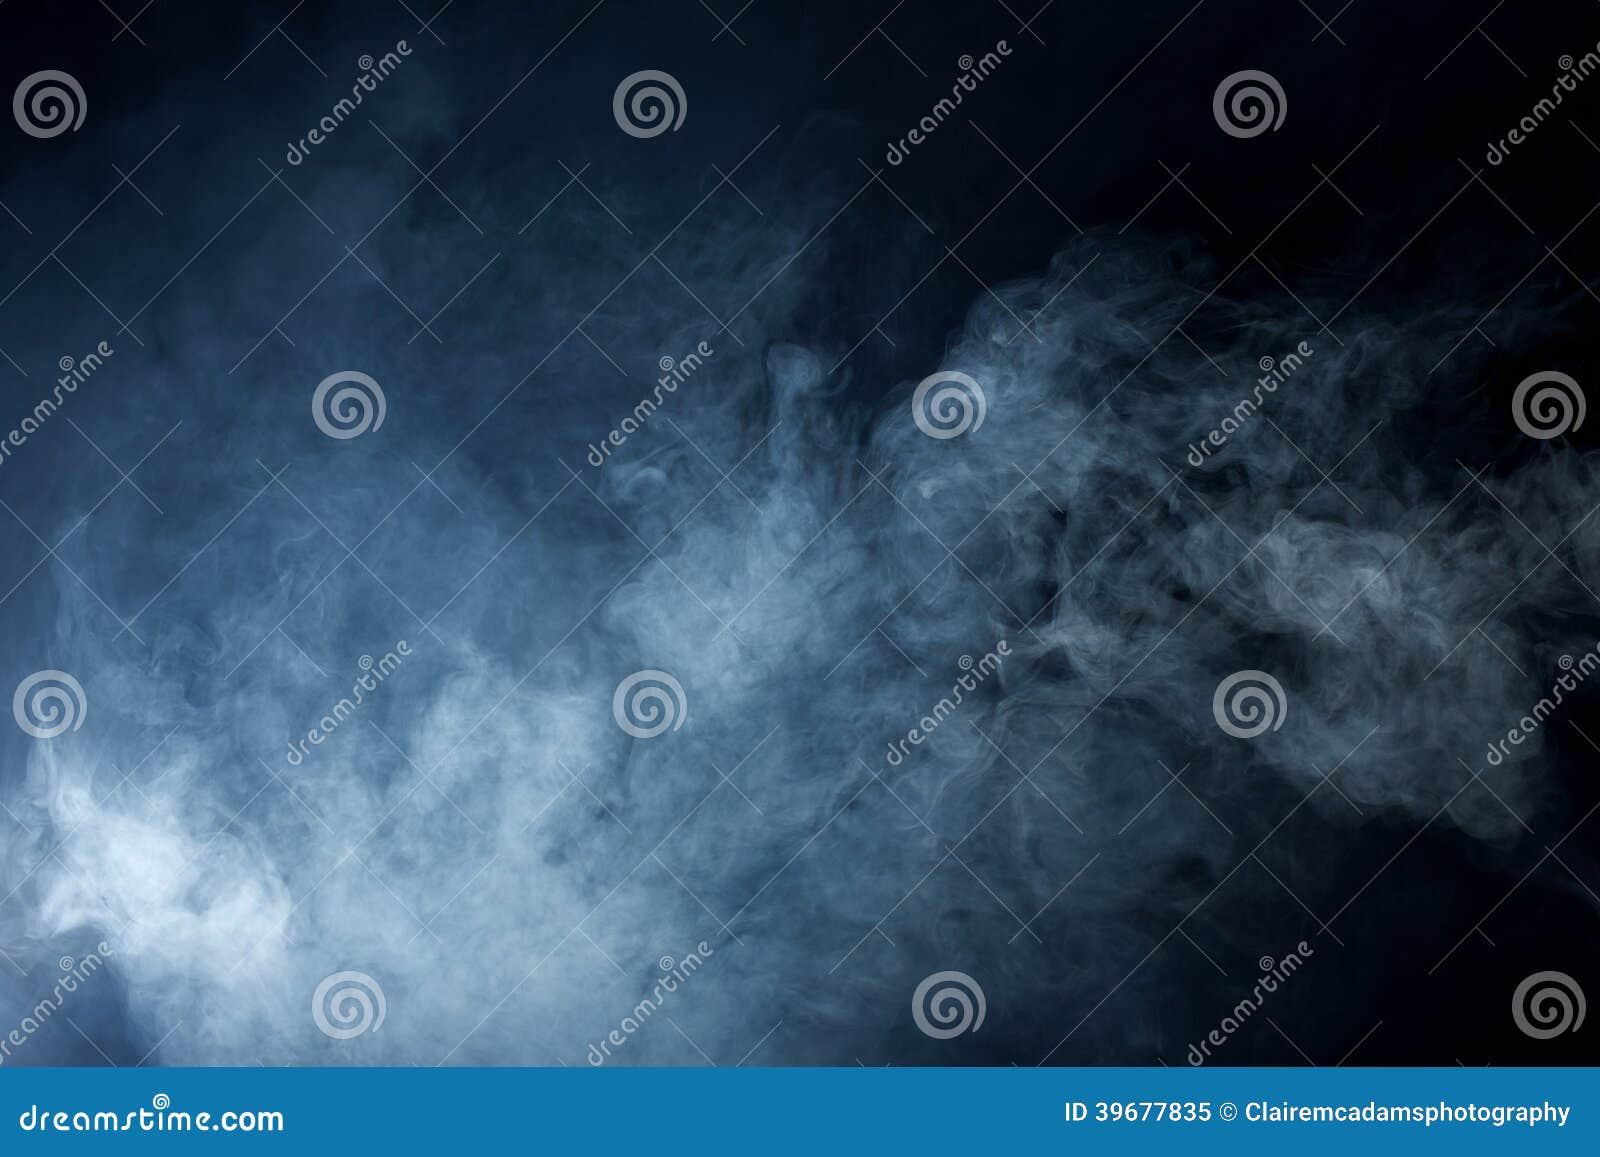 Blue/Grey Smoke on Black Background